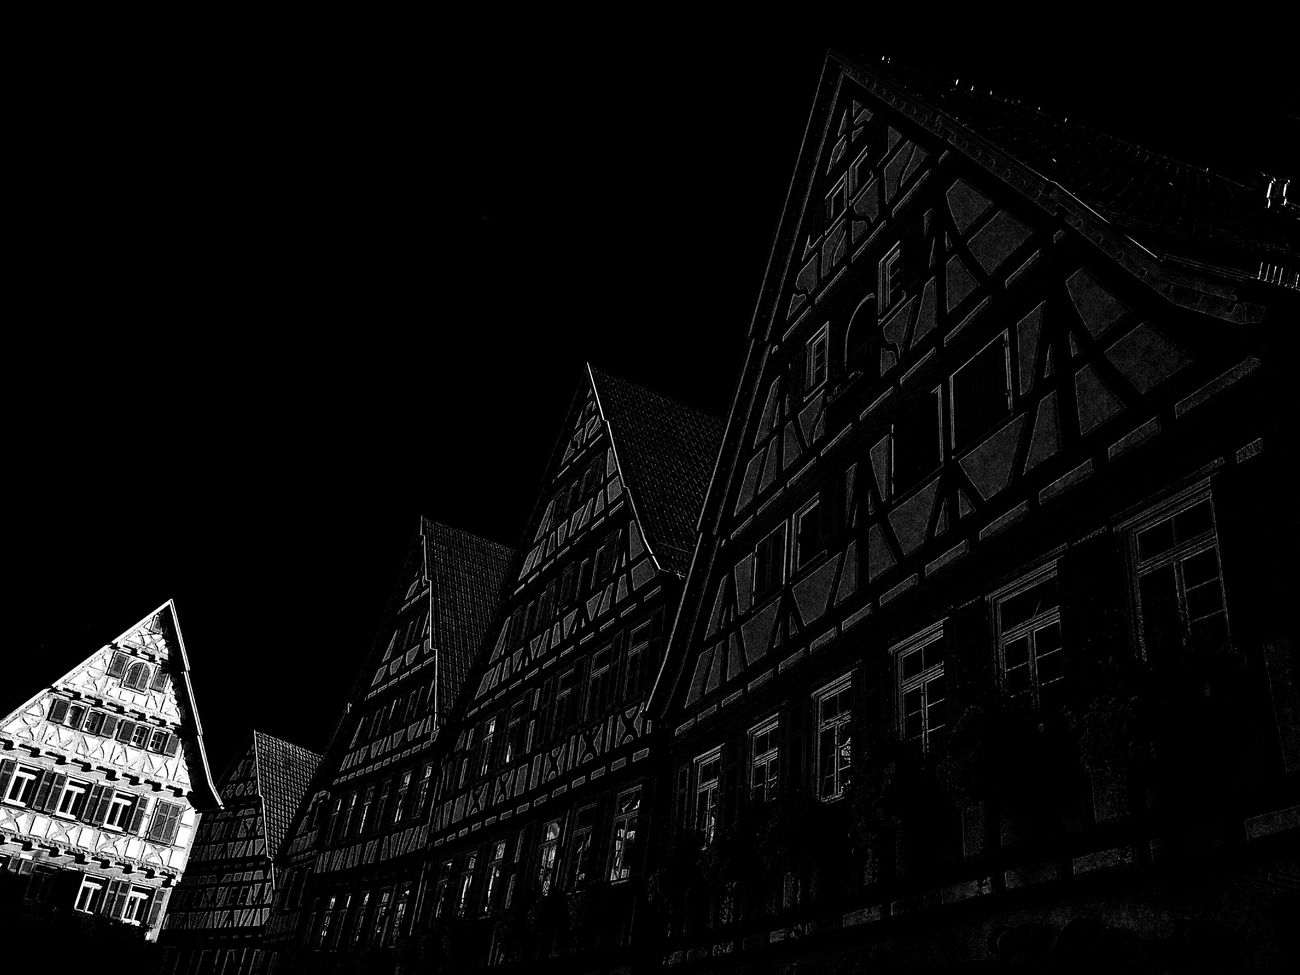 German Tour Architecture Blackandwhite Travelling Black And White Black & White Monochrome Streetphoto_bw Fortheloveofblackandwhite Bw_lover Blackandwhite Photography Bw_collection NEM Black&white Traveling